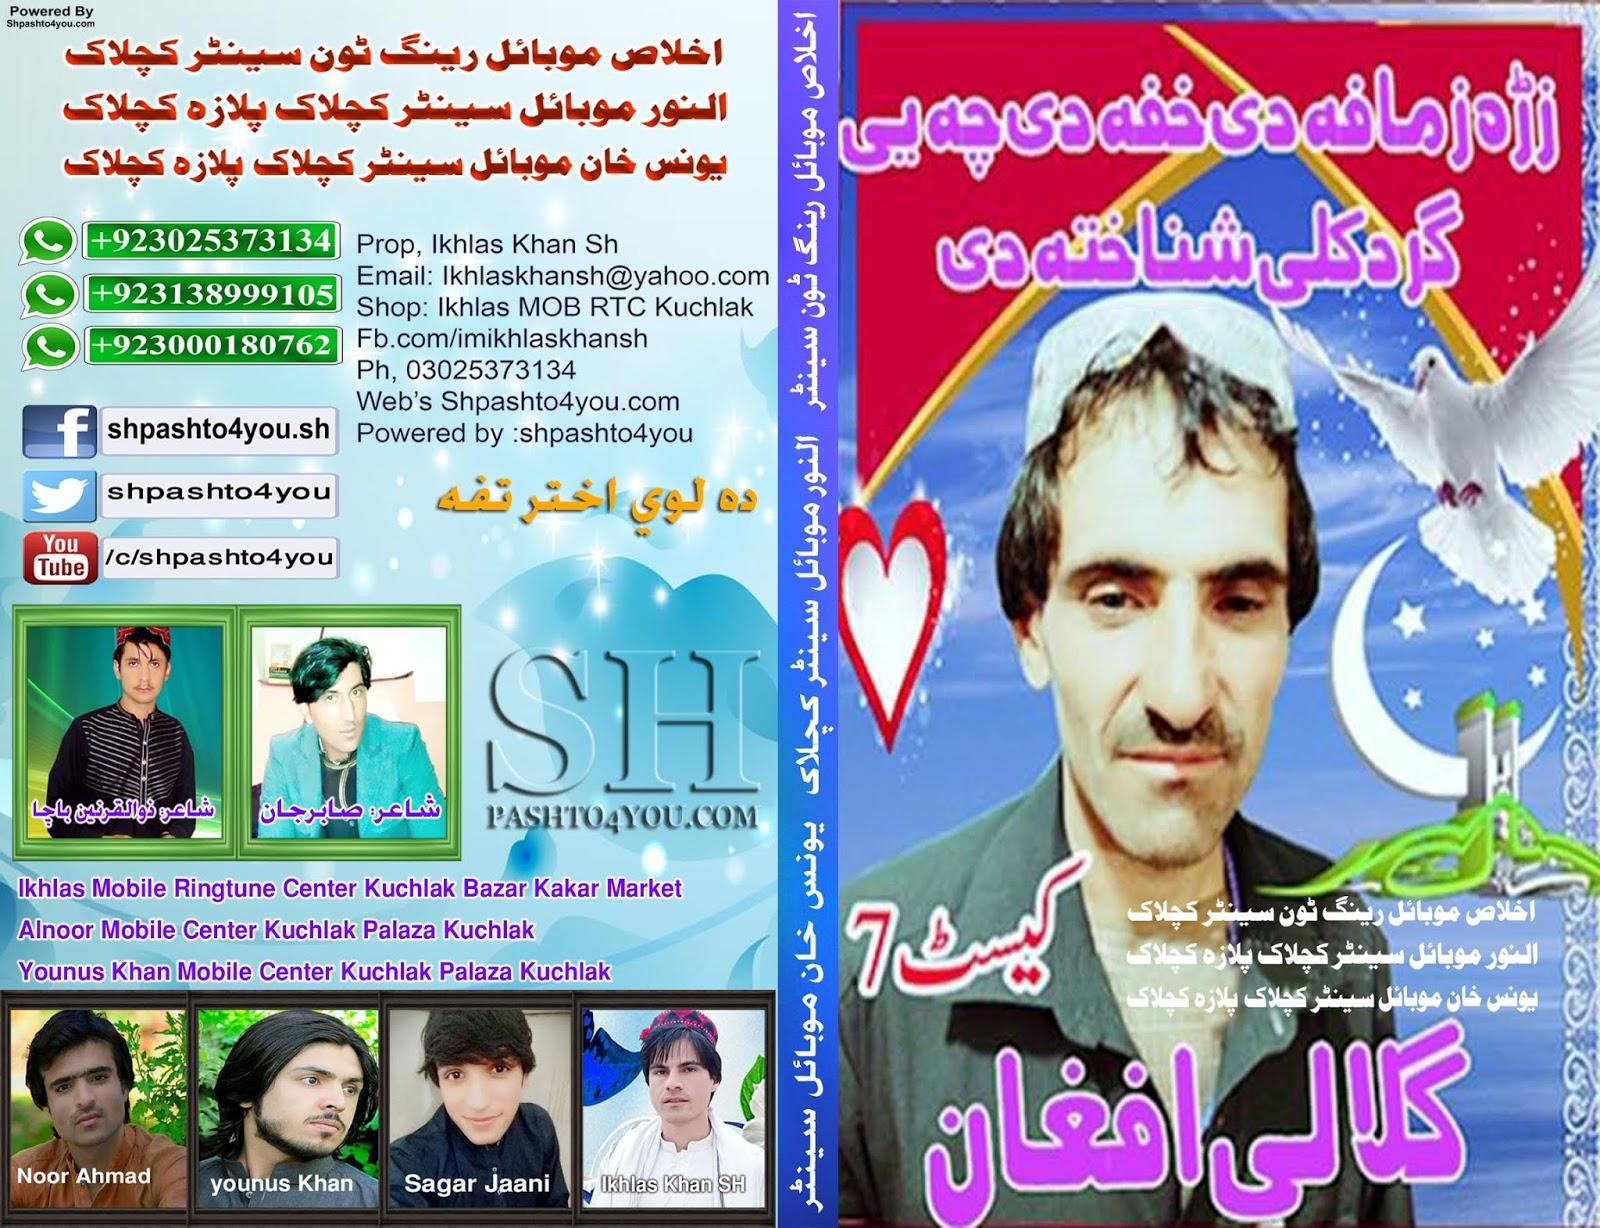 Gulali Afghan Pashto New Mp3 Songs 2017 Dec - Play Best Songs